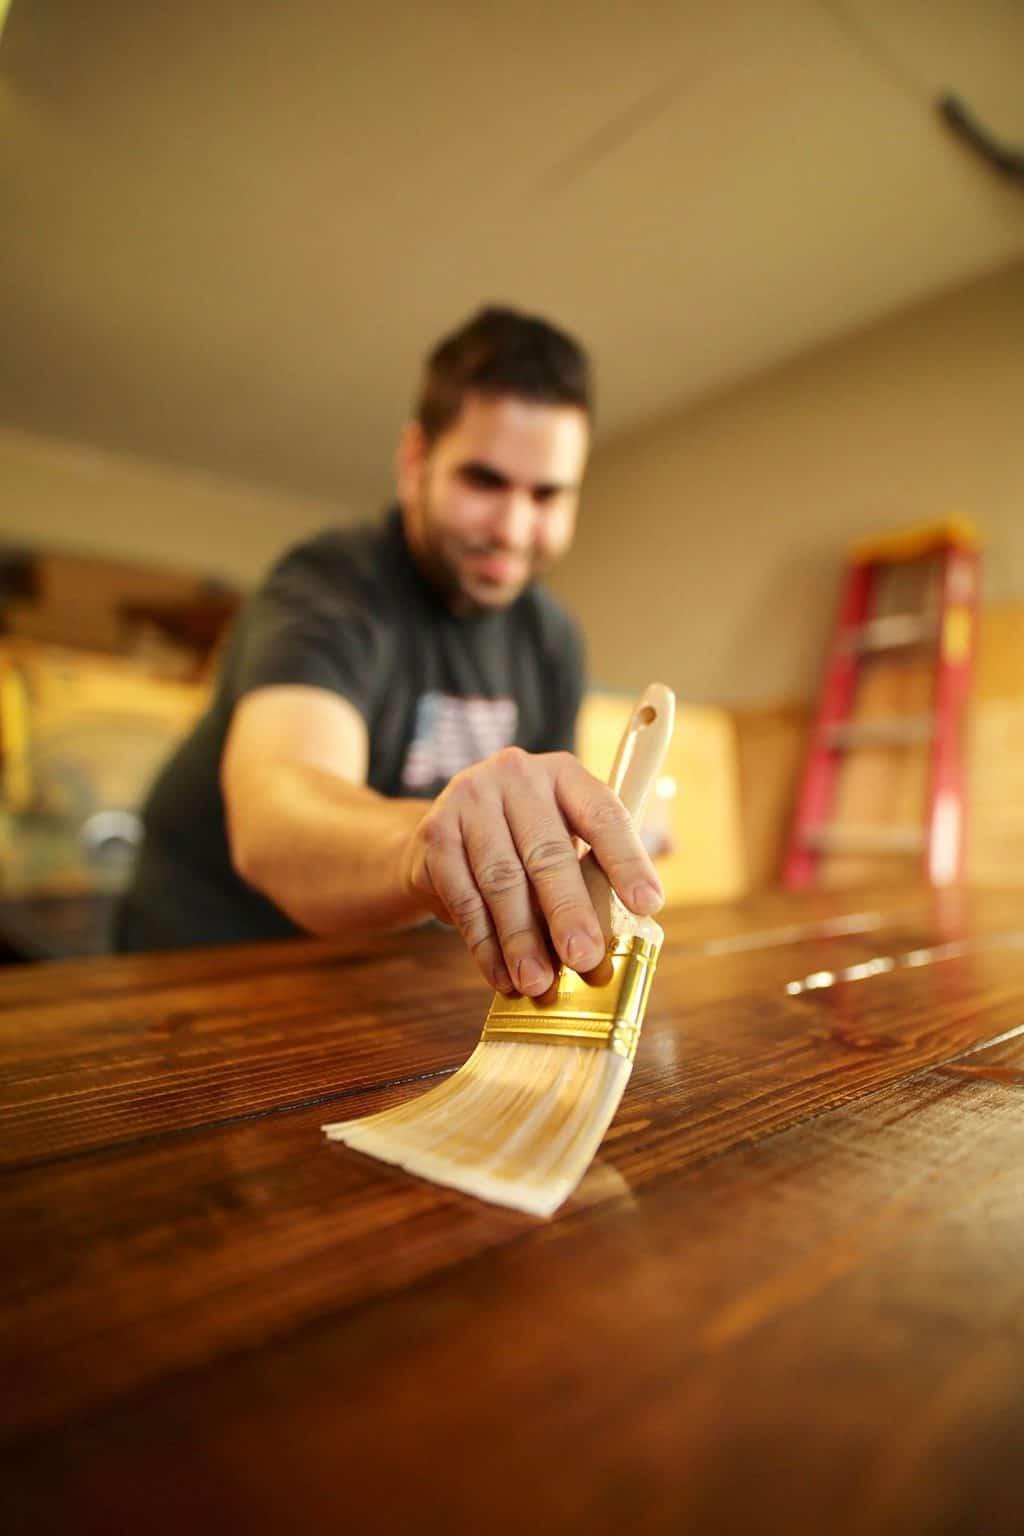 Man applying oil-based finish on wood